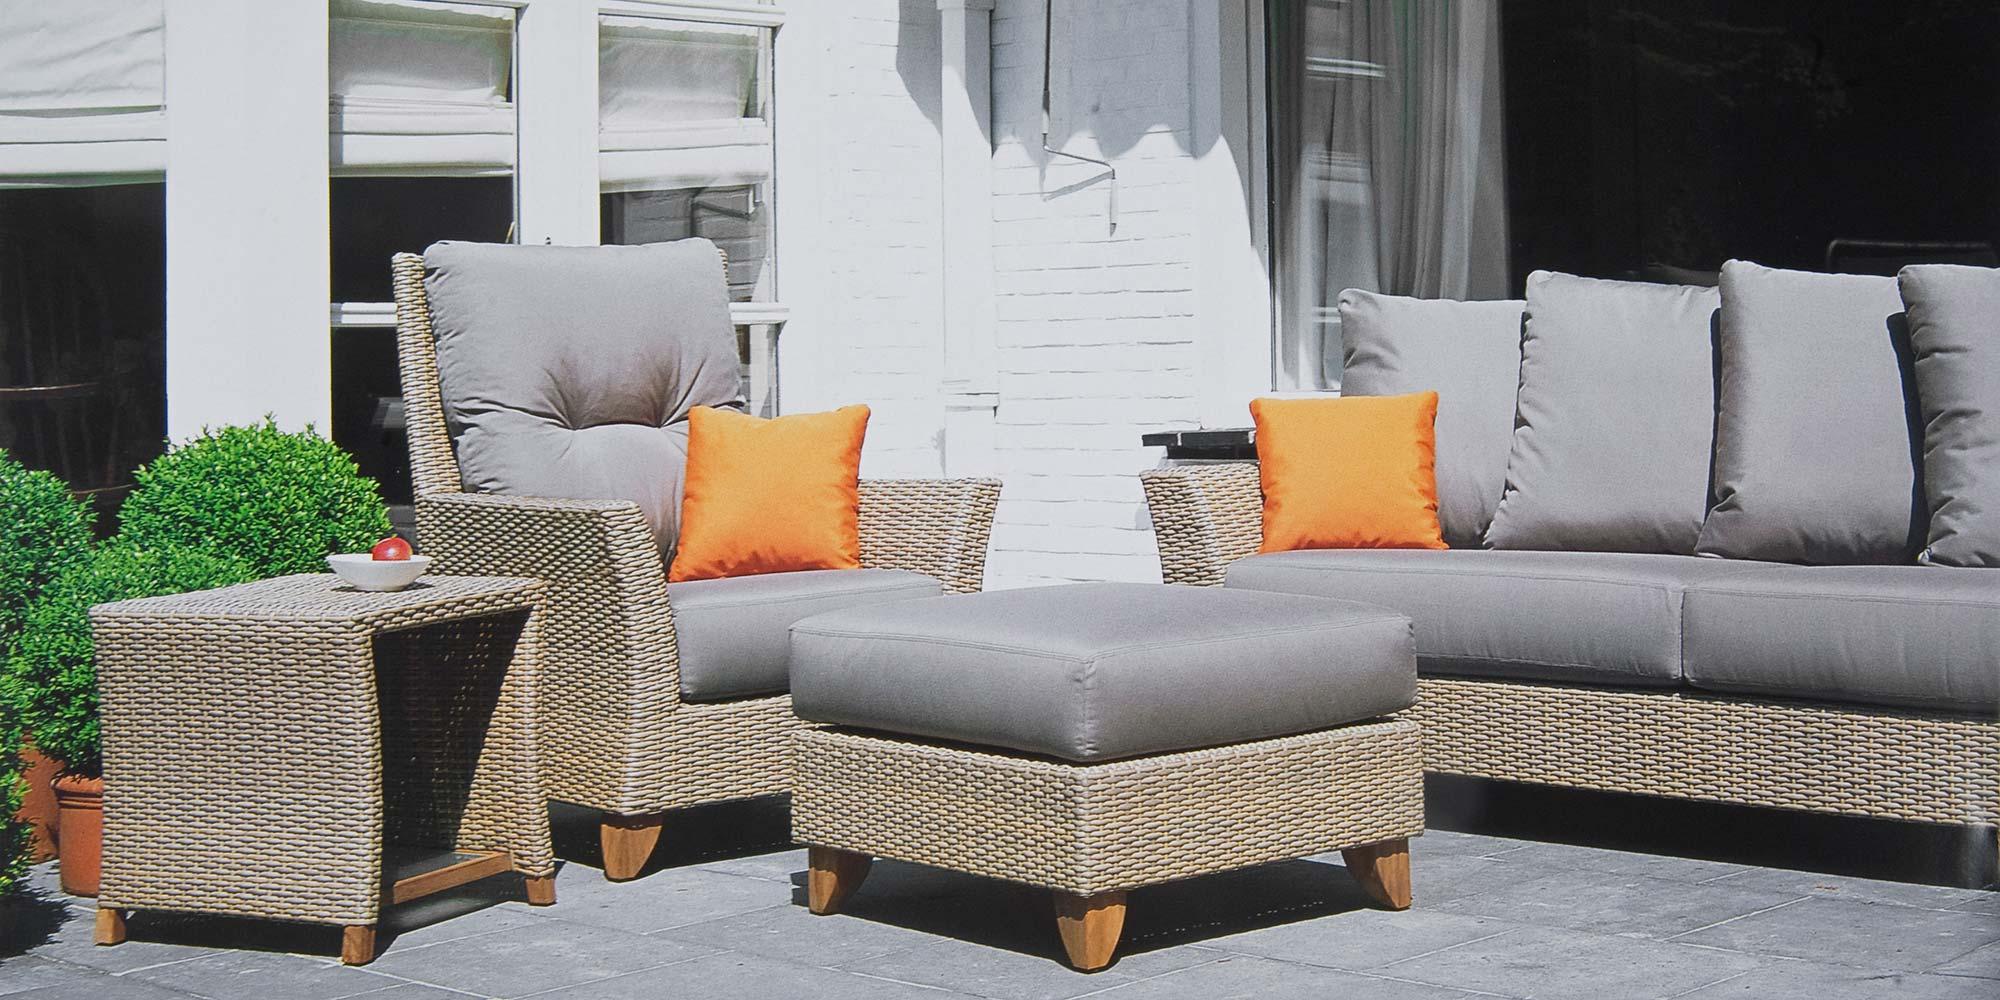 terrassenm bel reitmeier korbm bel aus m nster. Black Bedroom Furniture Sets. Home Design Ideas